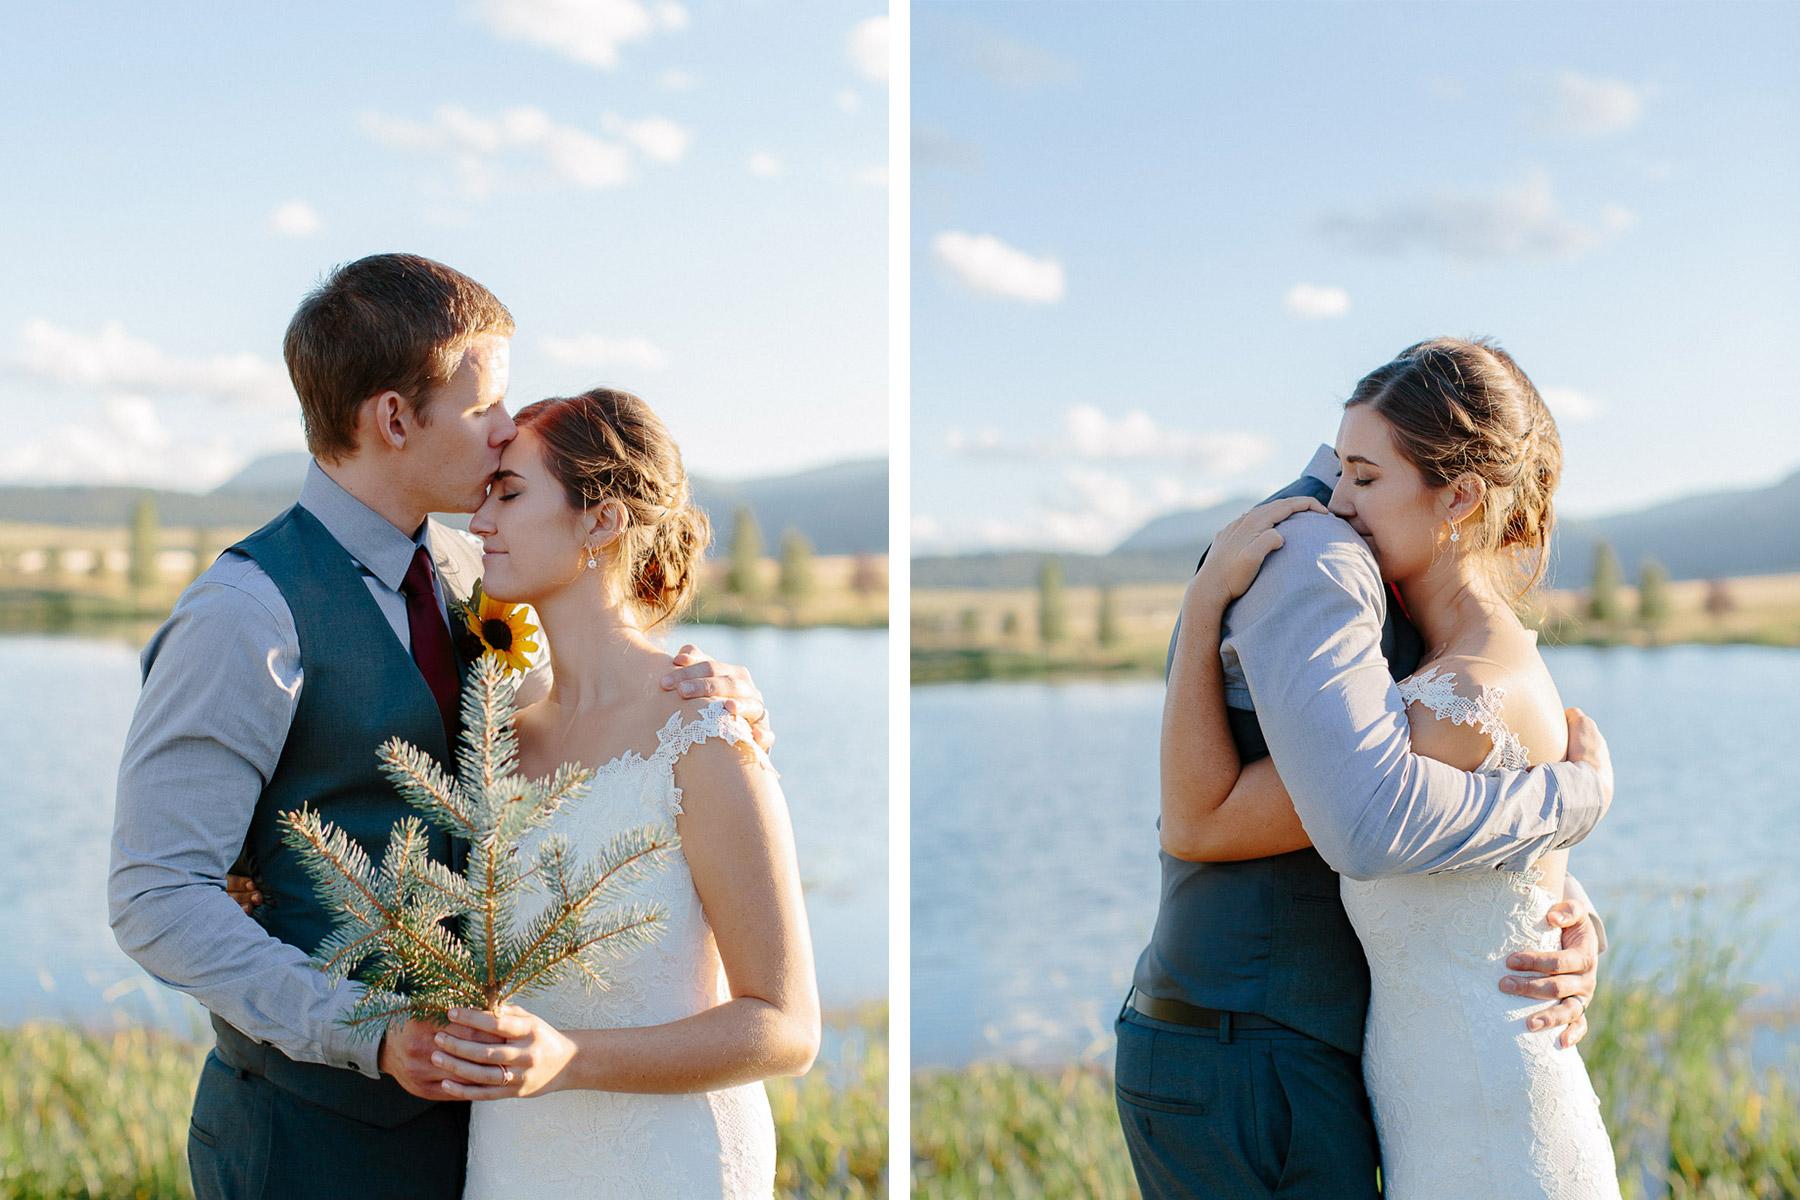 160902-Luxium-Weddings-Arizona-Michael-Becca-Spruce-Mountain-Ranch-Colorado-webres-089a.jpg